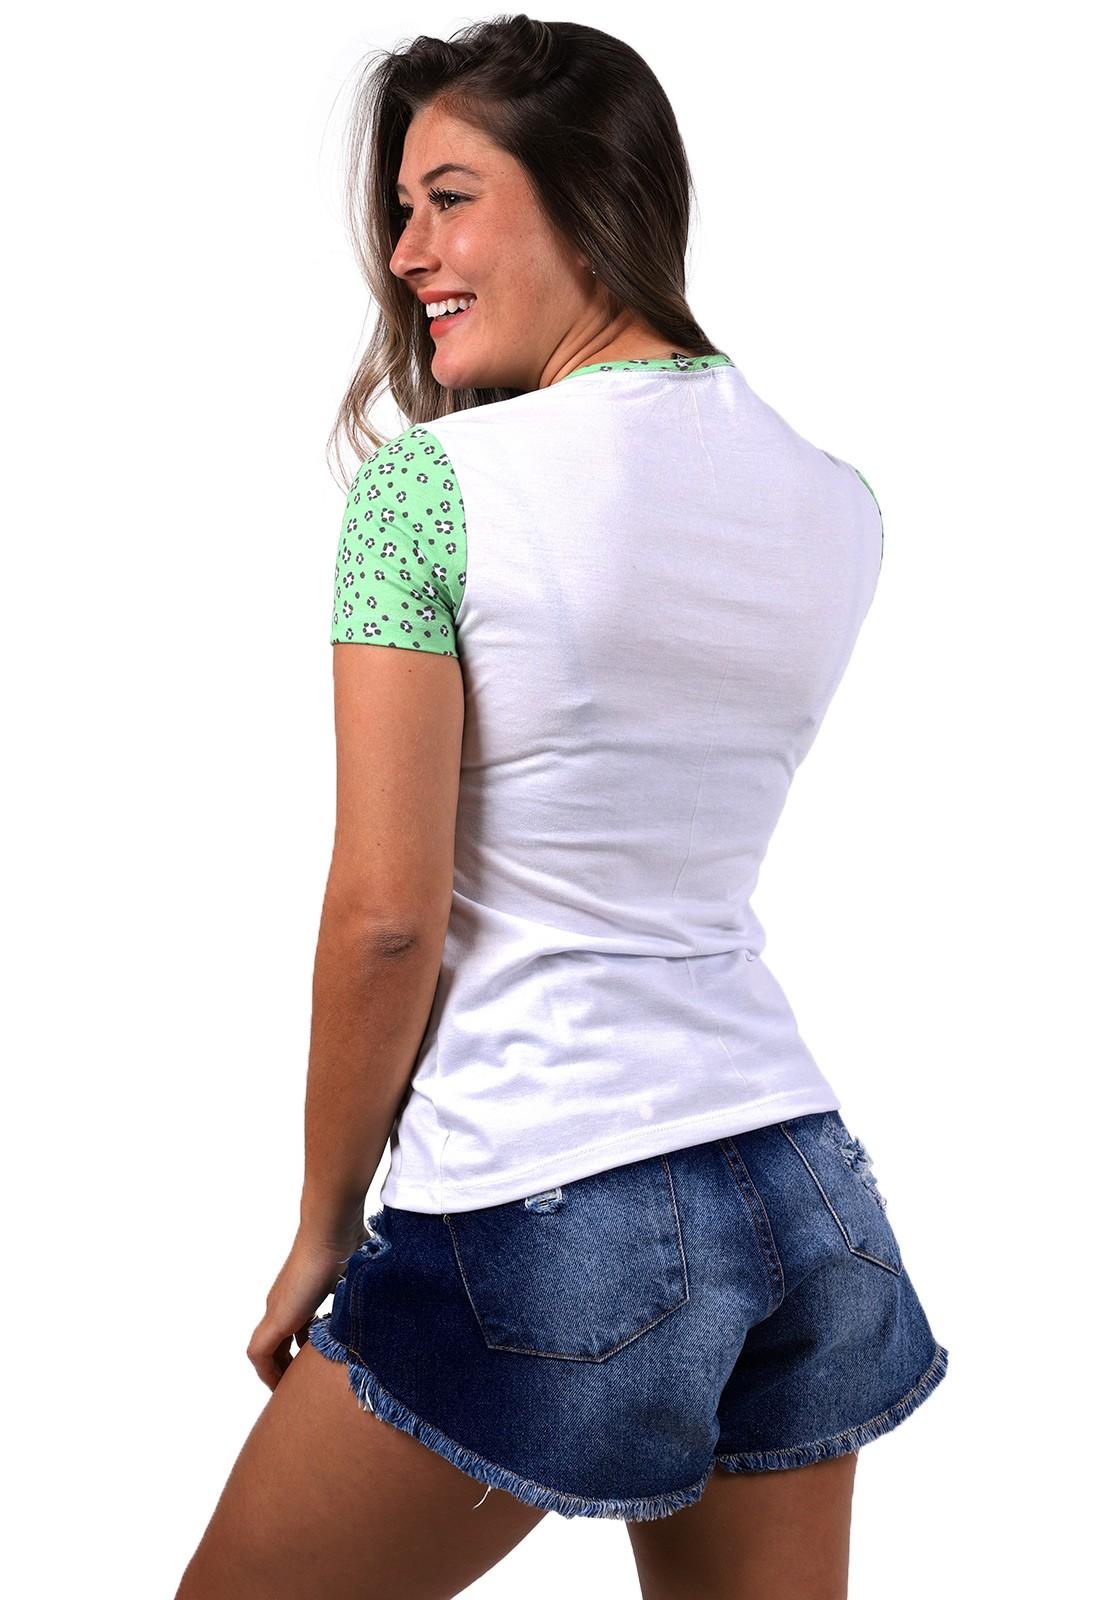 Blusinha Vida Marinha Manga Curta Branco/Verde